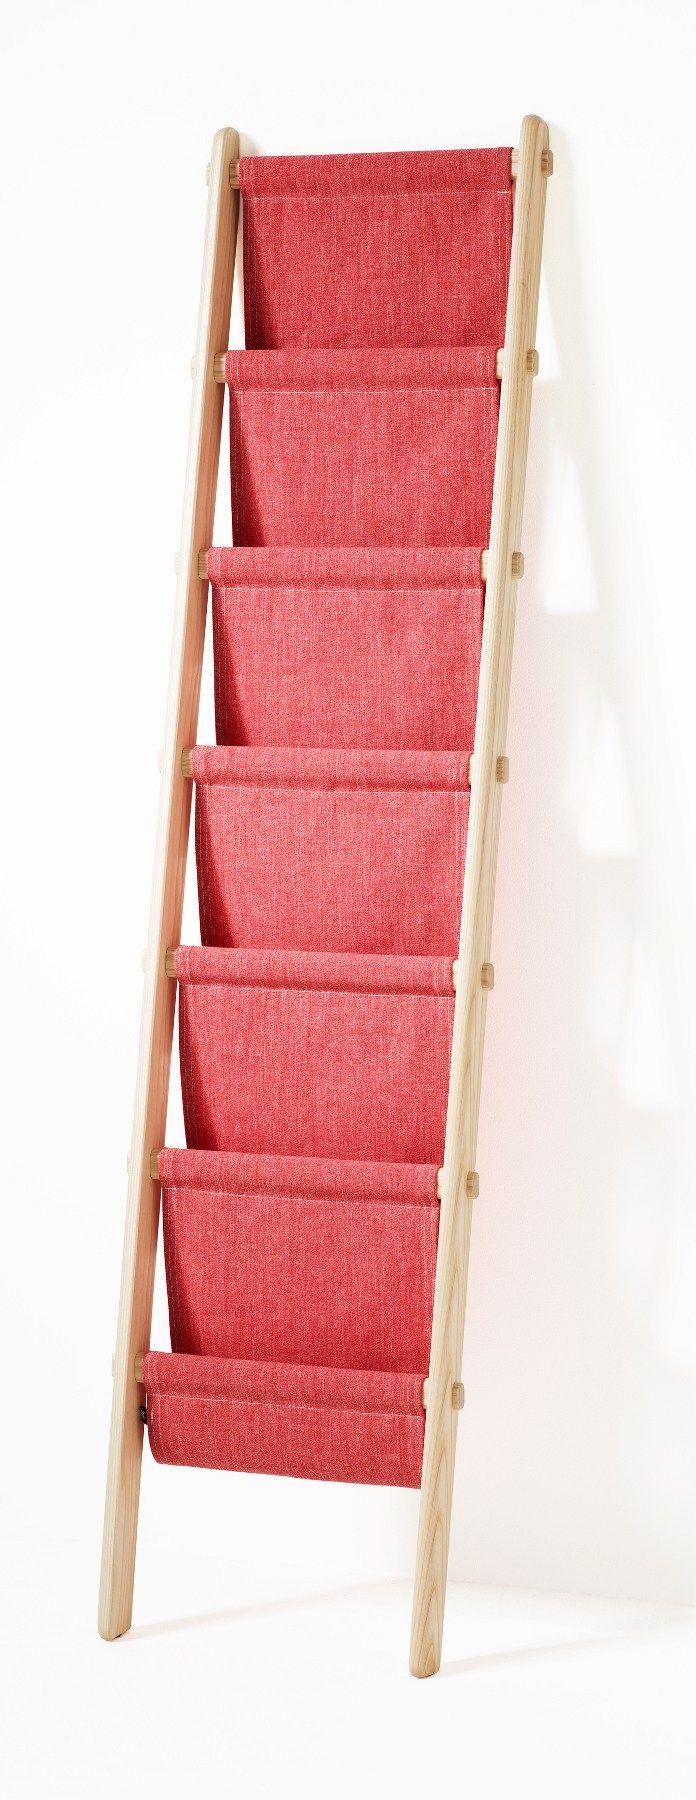 Revistero zapatero de madera maciza plisado by karl for Disenos de zapateros en madera